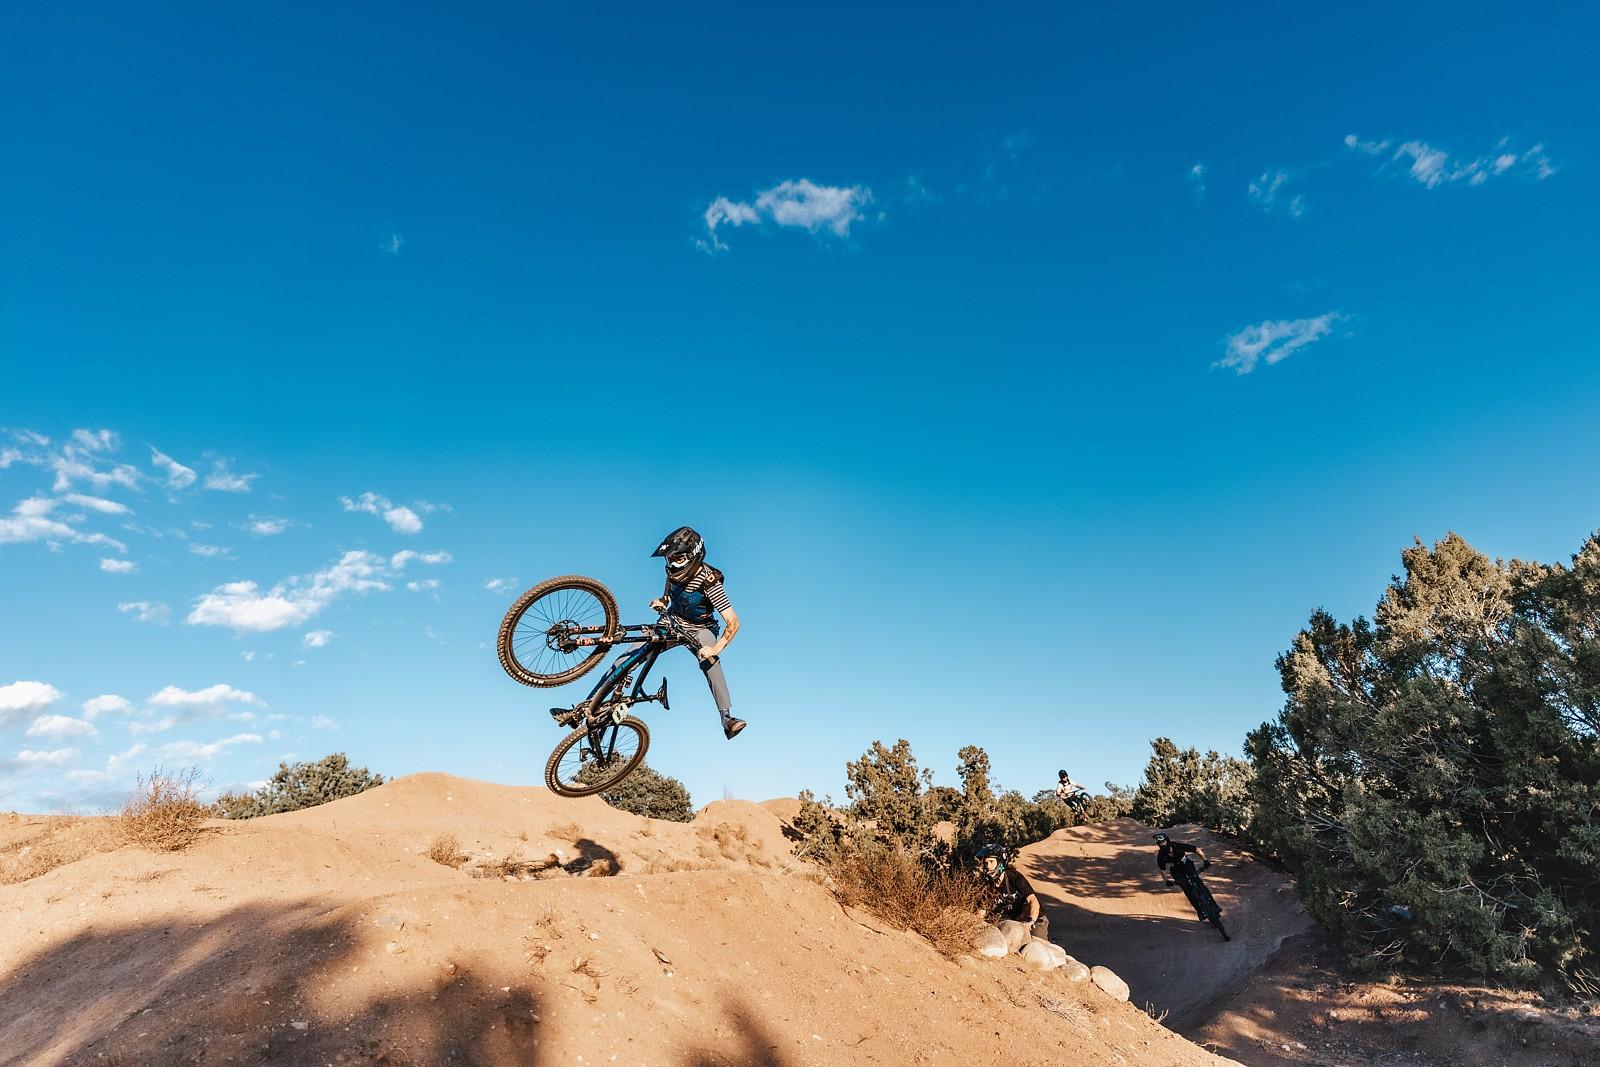 Party Train - legpwr - Mountain Biking Pictures - Vital MTB